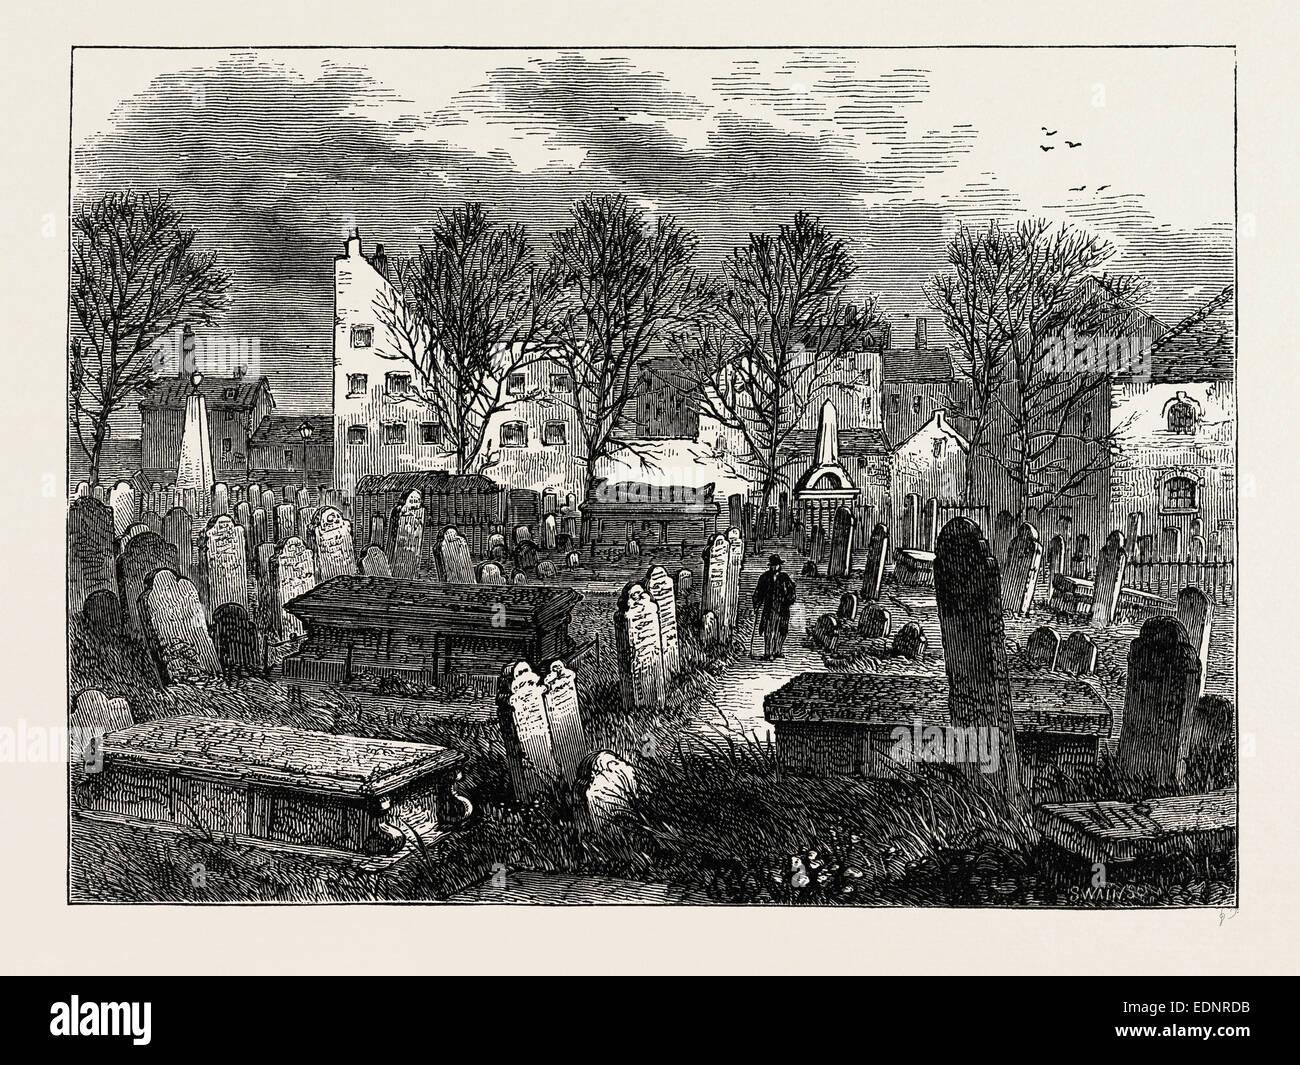 BUNHILL FIELDS BURIAL-GROUND. London, UK, 19th century engraving - Stock Image